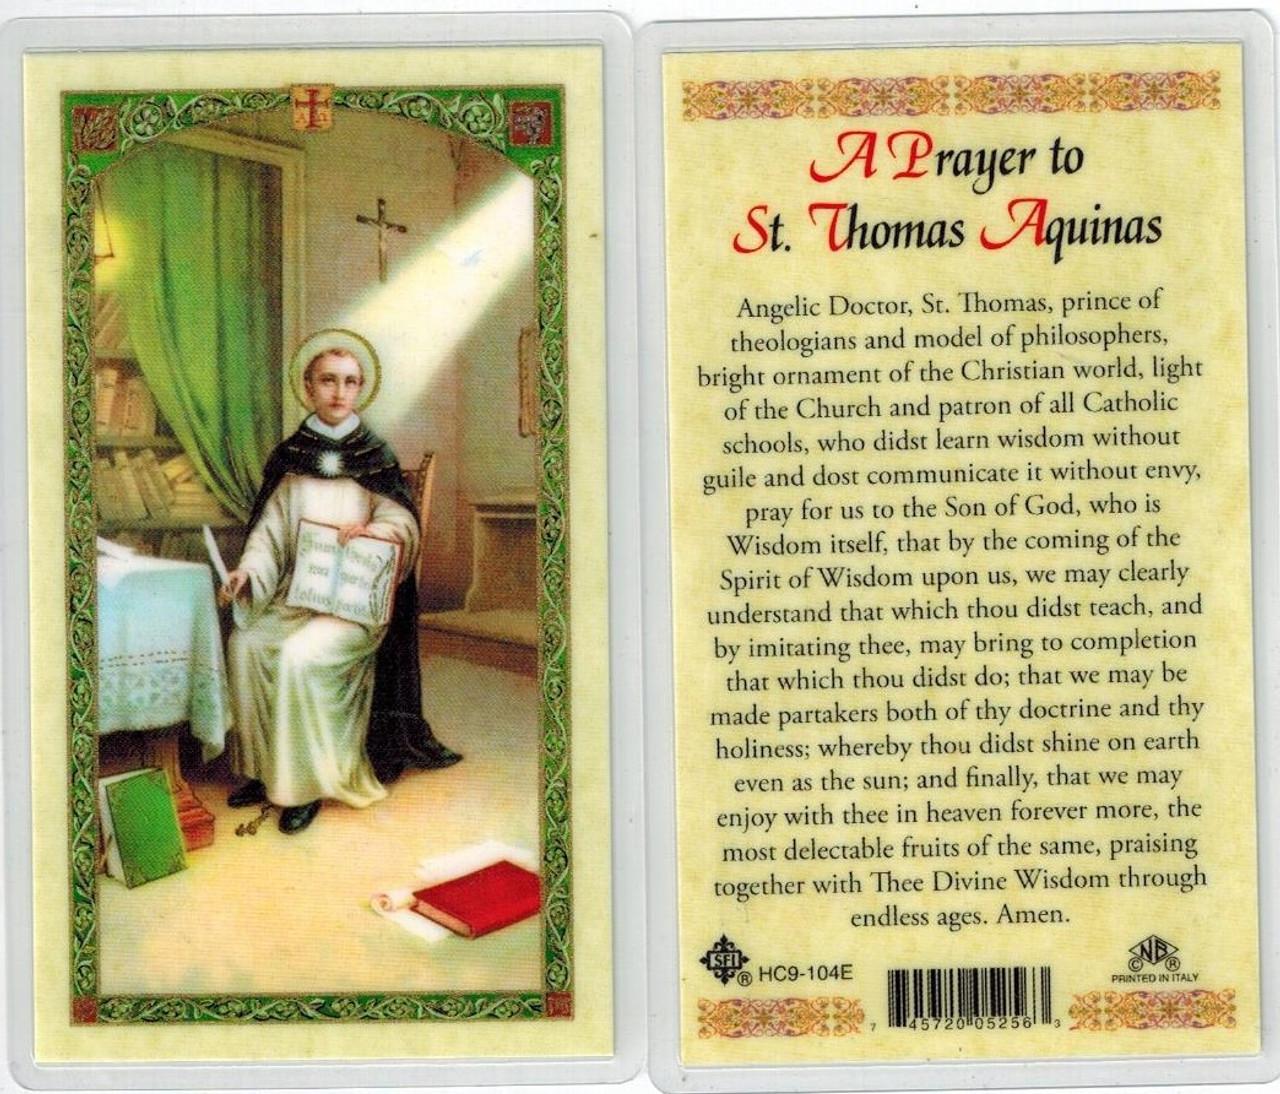 A Prayer to St. Thomas Aquinas, laminated prayer card